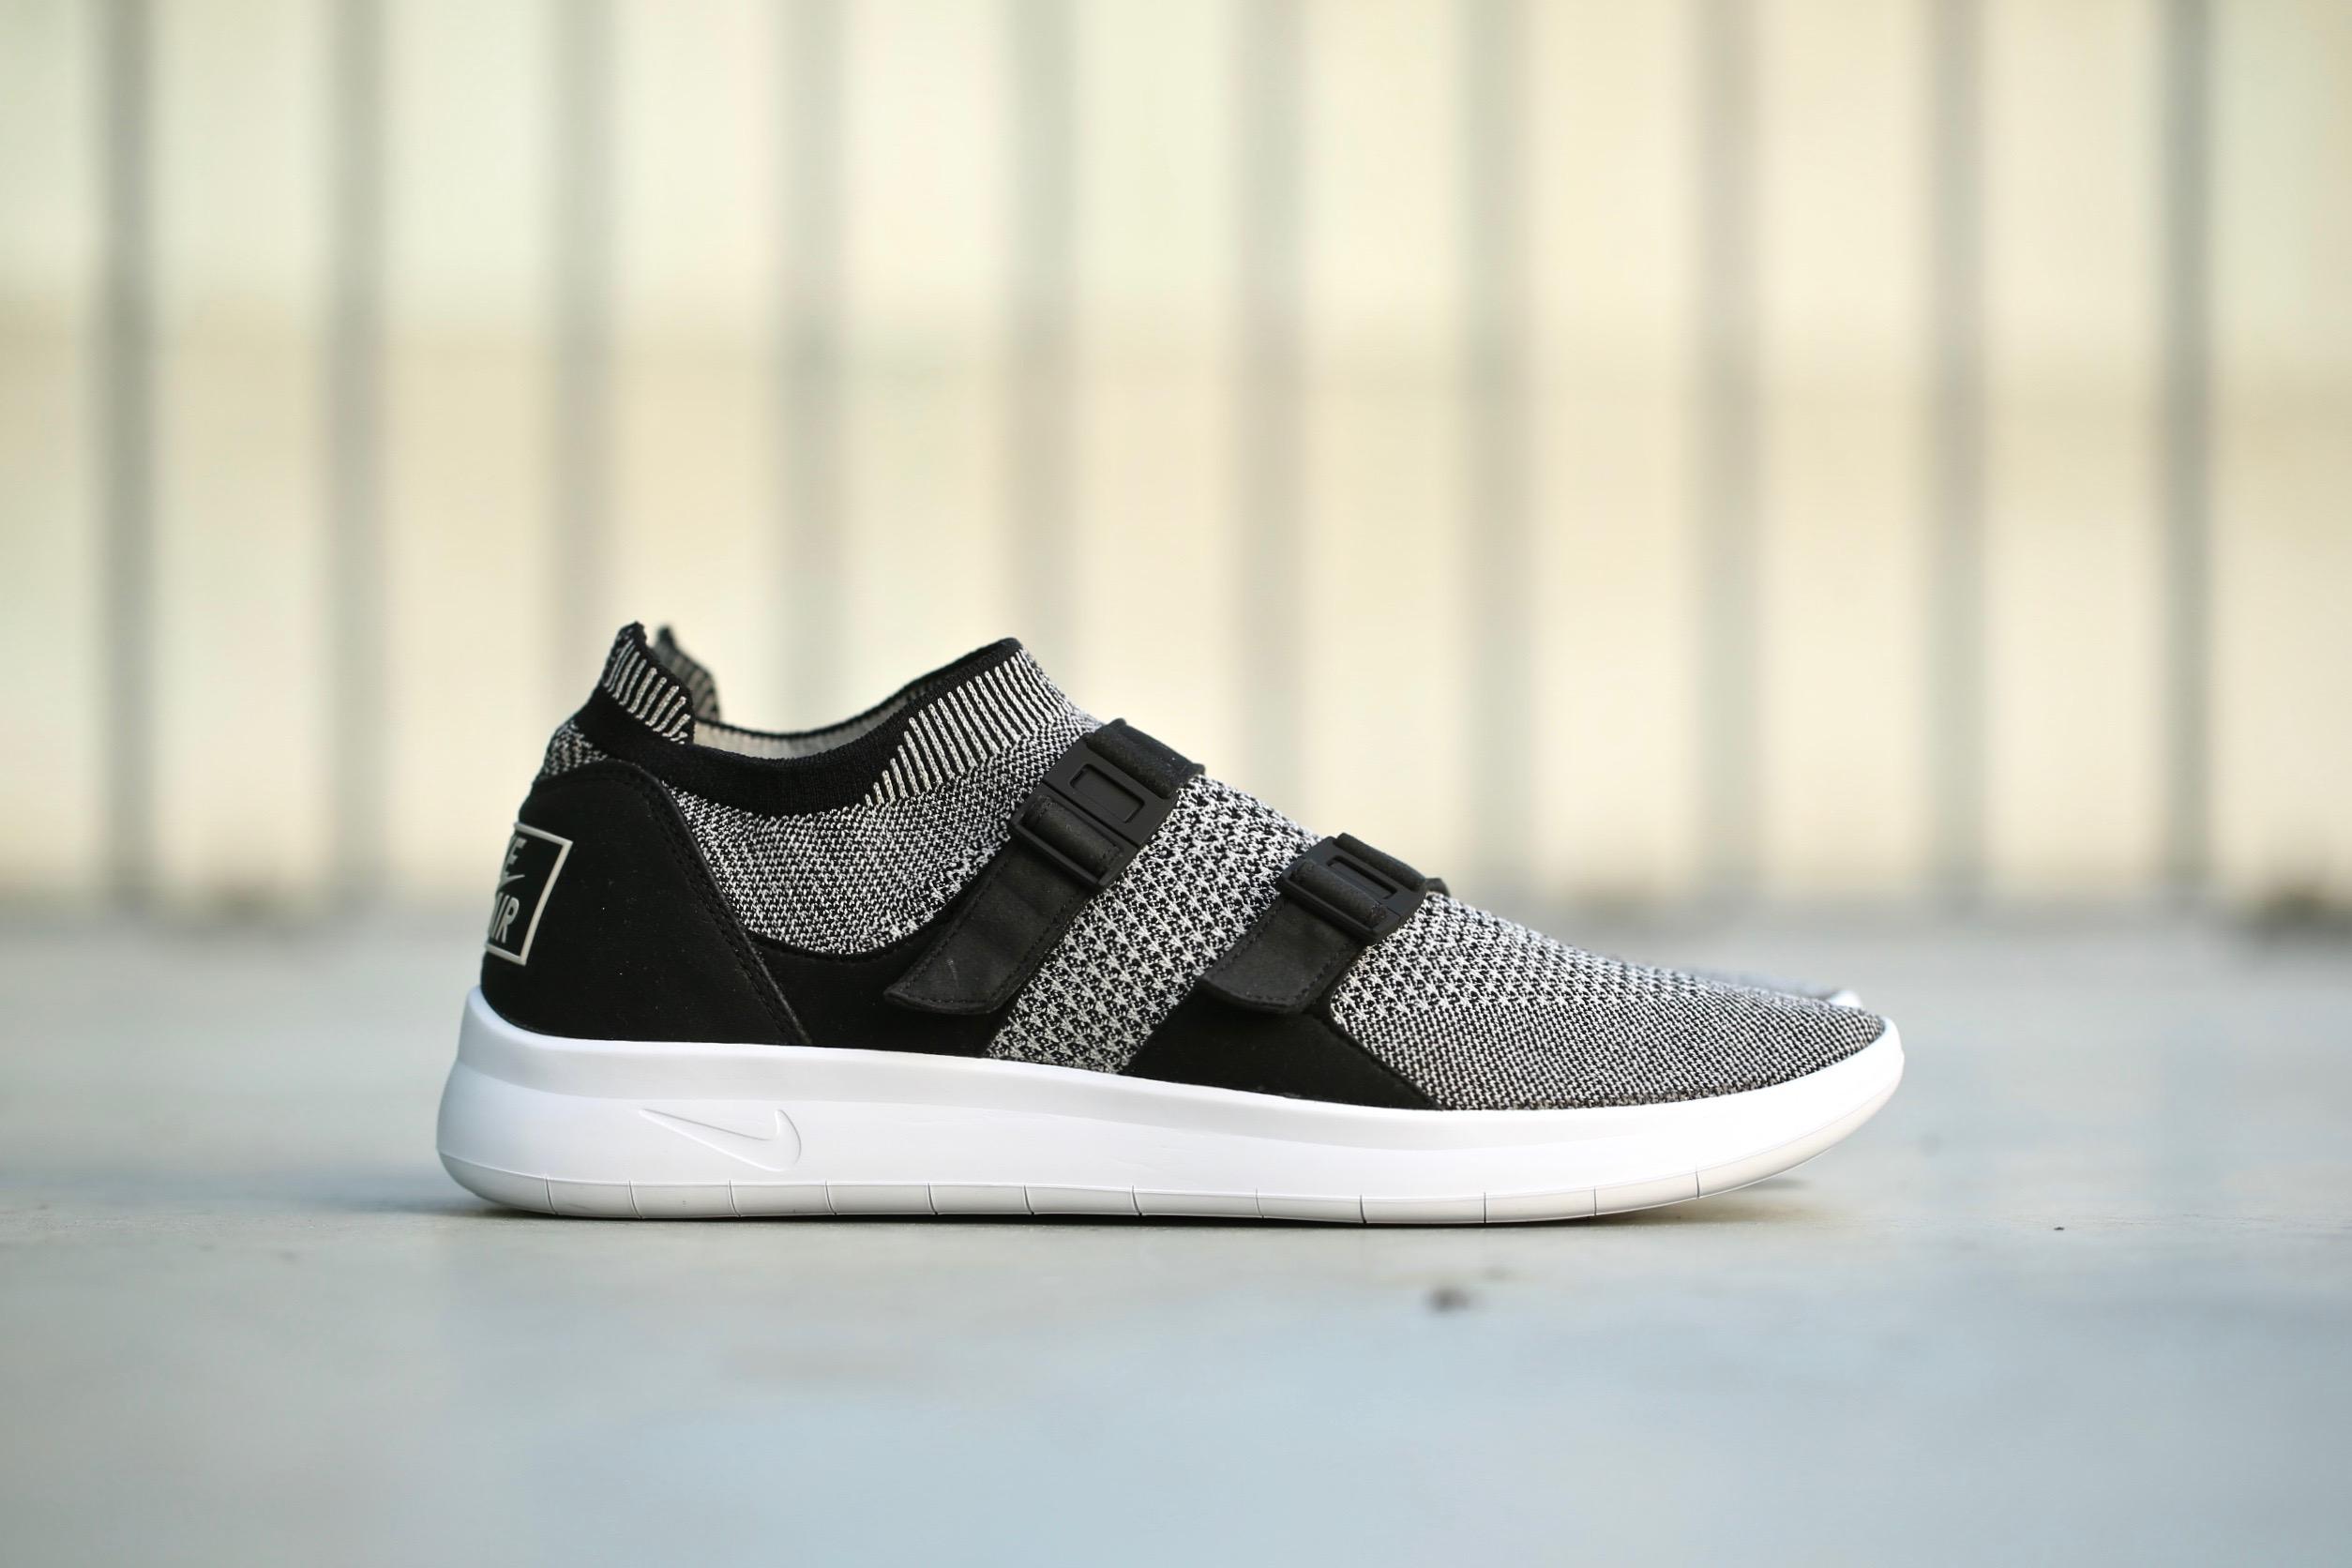 b2c8cd7015aa3 Nike Air Sock Racer Ultra Flyknit – Black   Pale Grey   Black ...